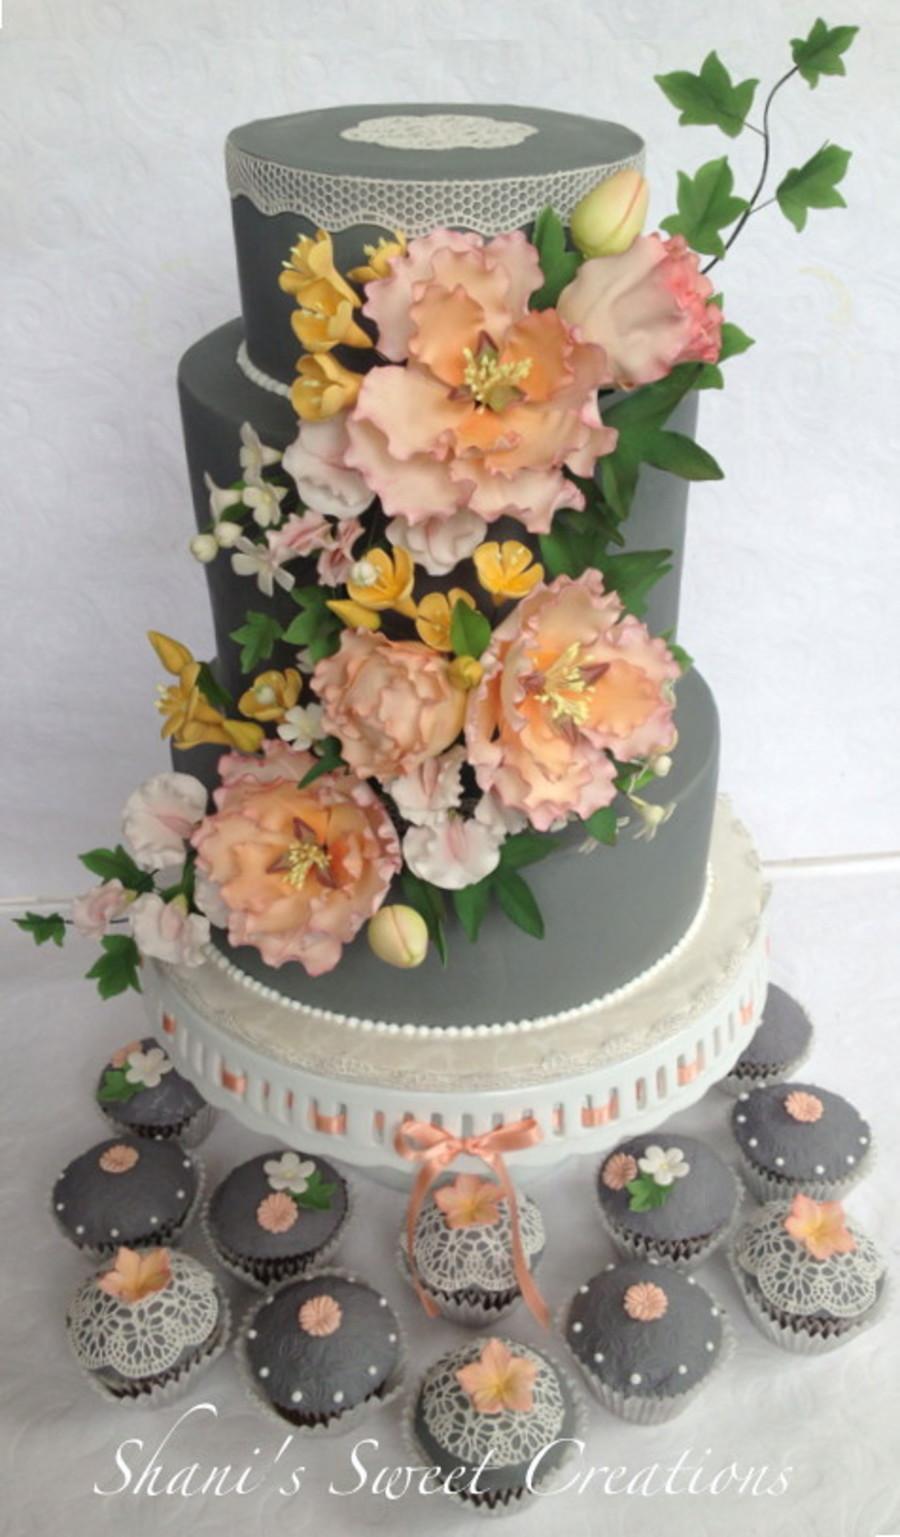 Sugar Flowers For Wedding Cakes  Wedding Cake And Matching Cupcakes With Sugar Flowers And